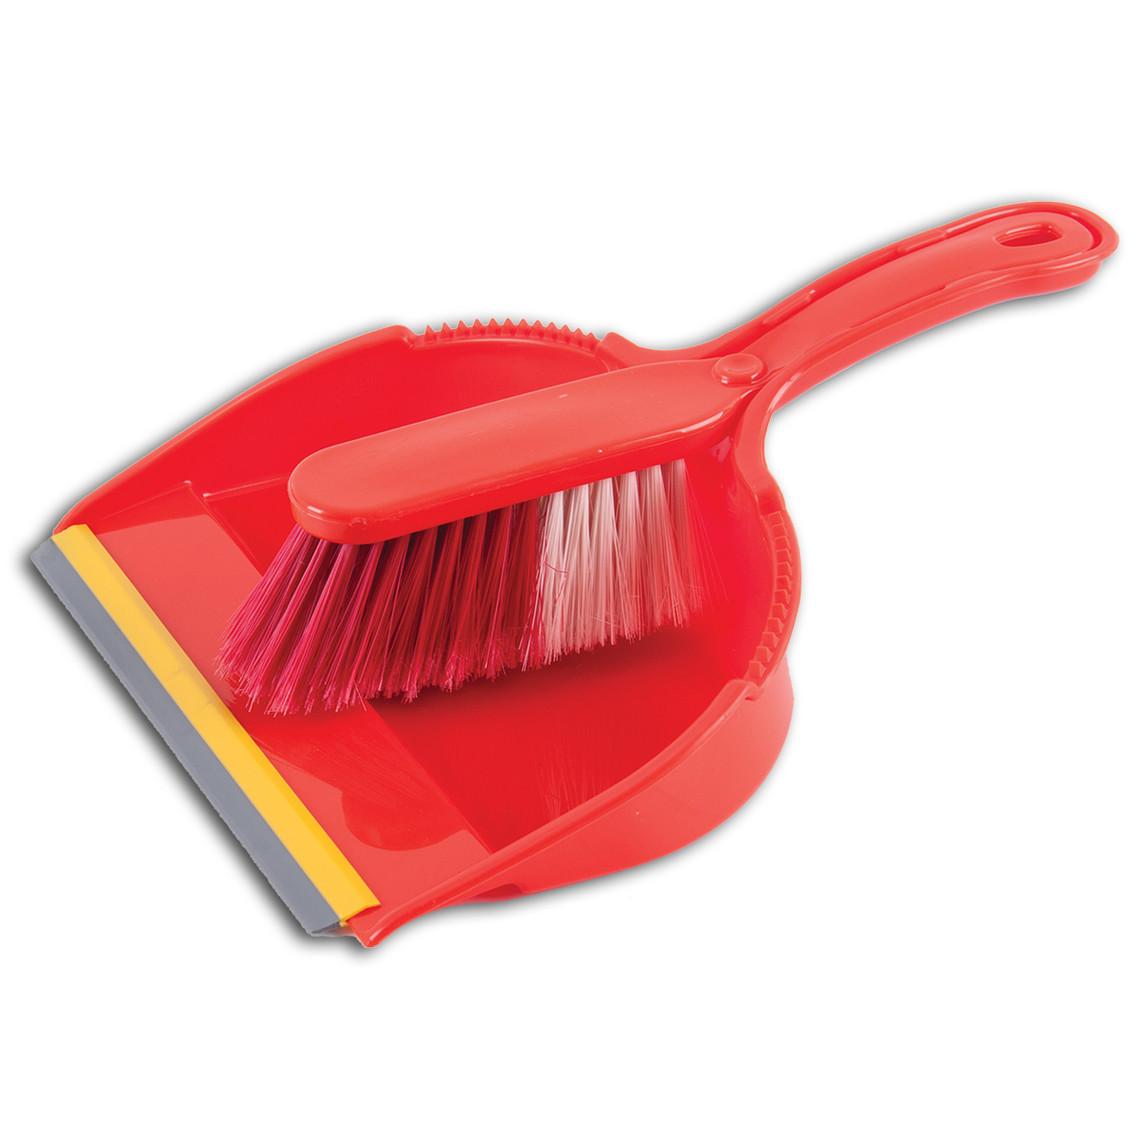 Cleanpex Fırçalı Faraş